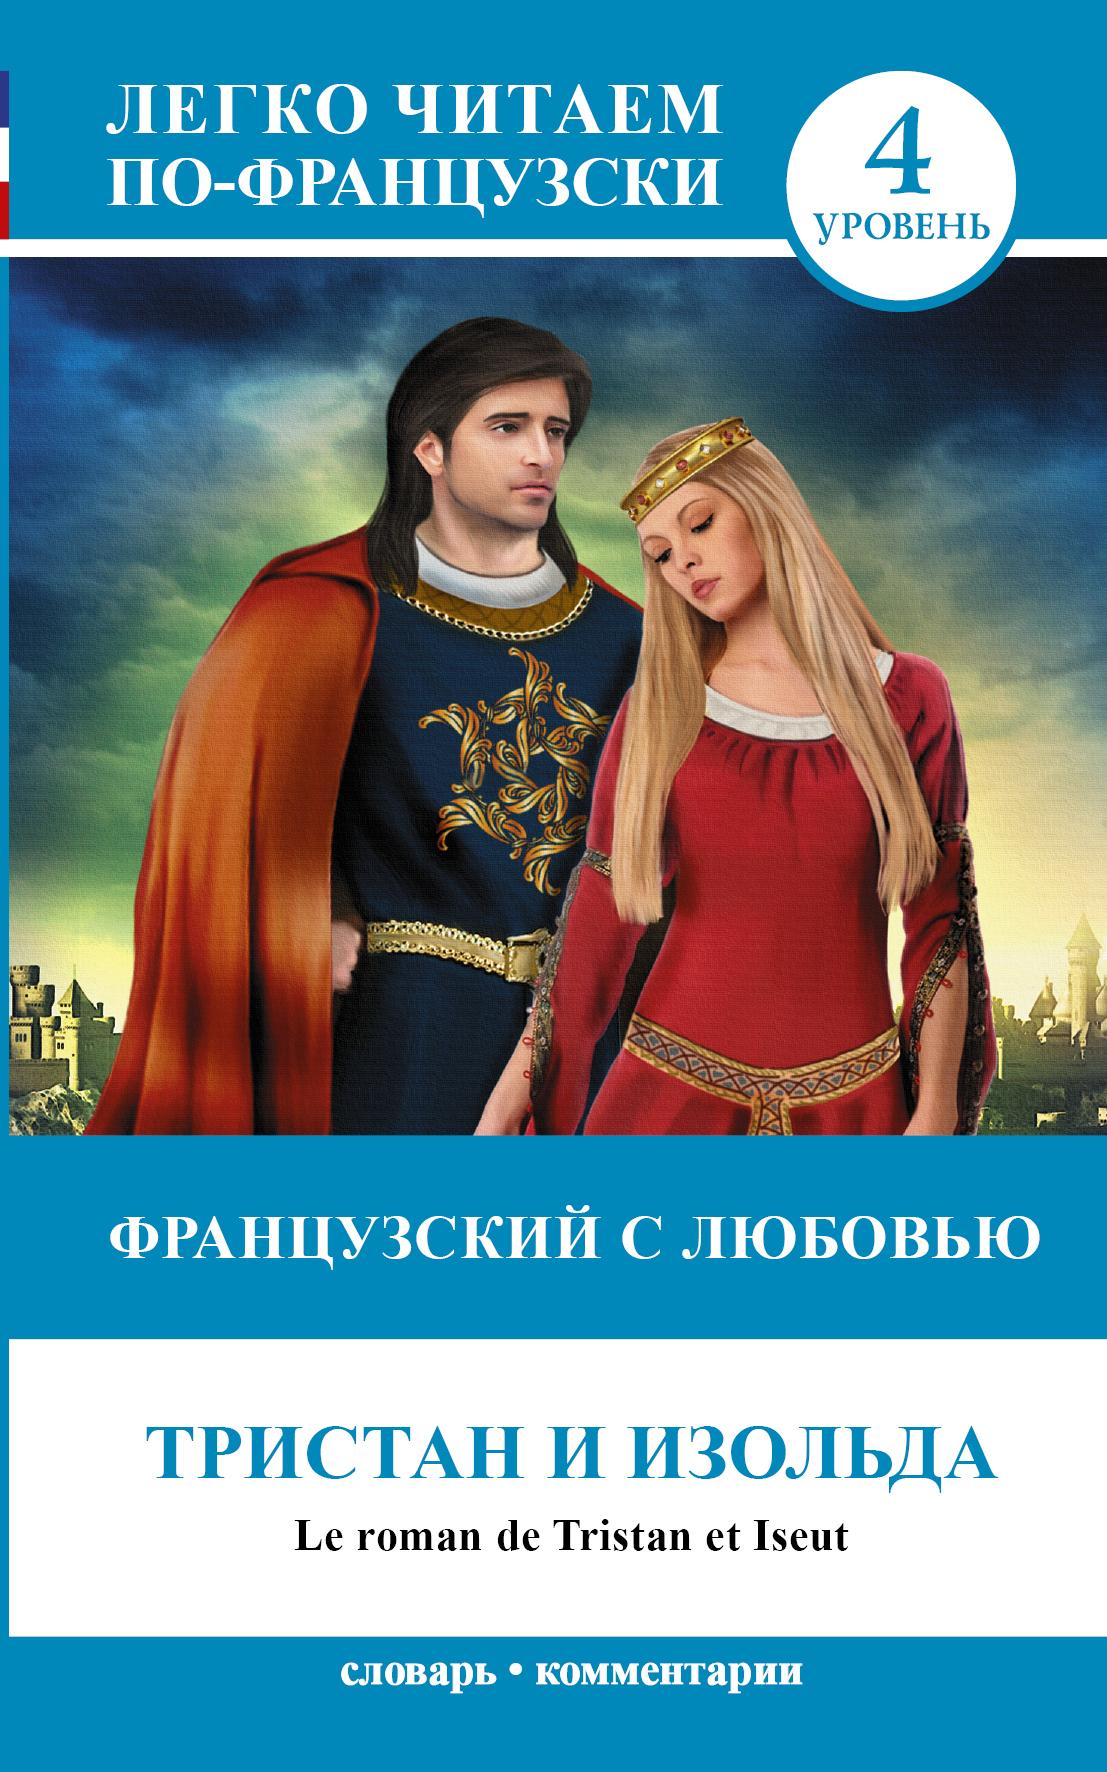 Французский с любовью: Тристан и Изольда ( Бакаева С.А., Долгорукова Н.М.  )